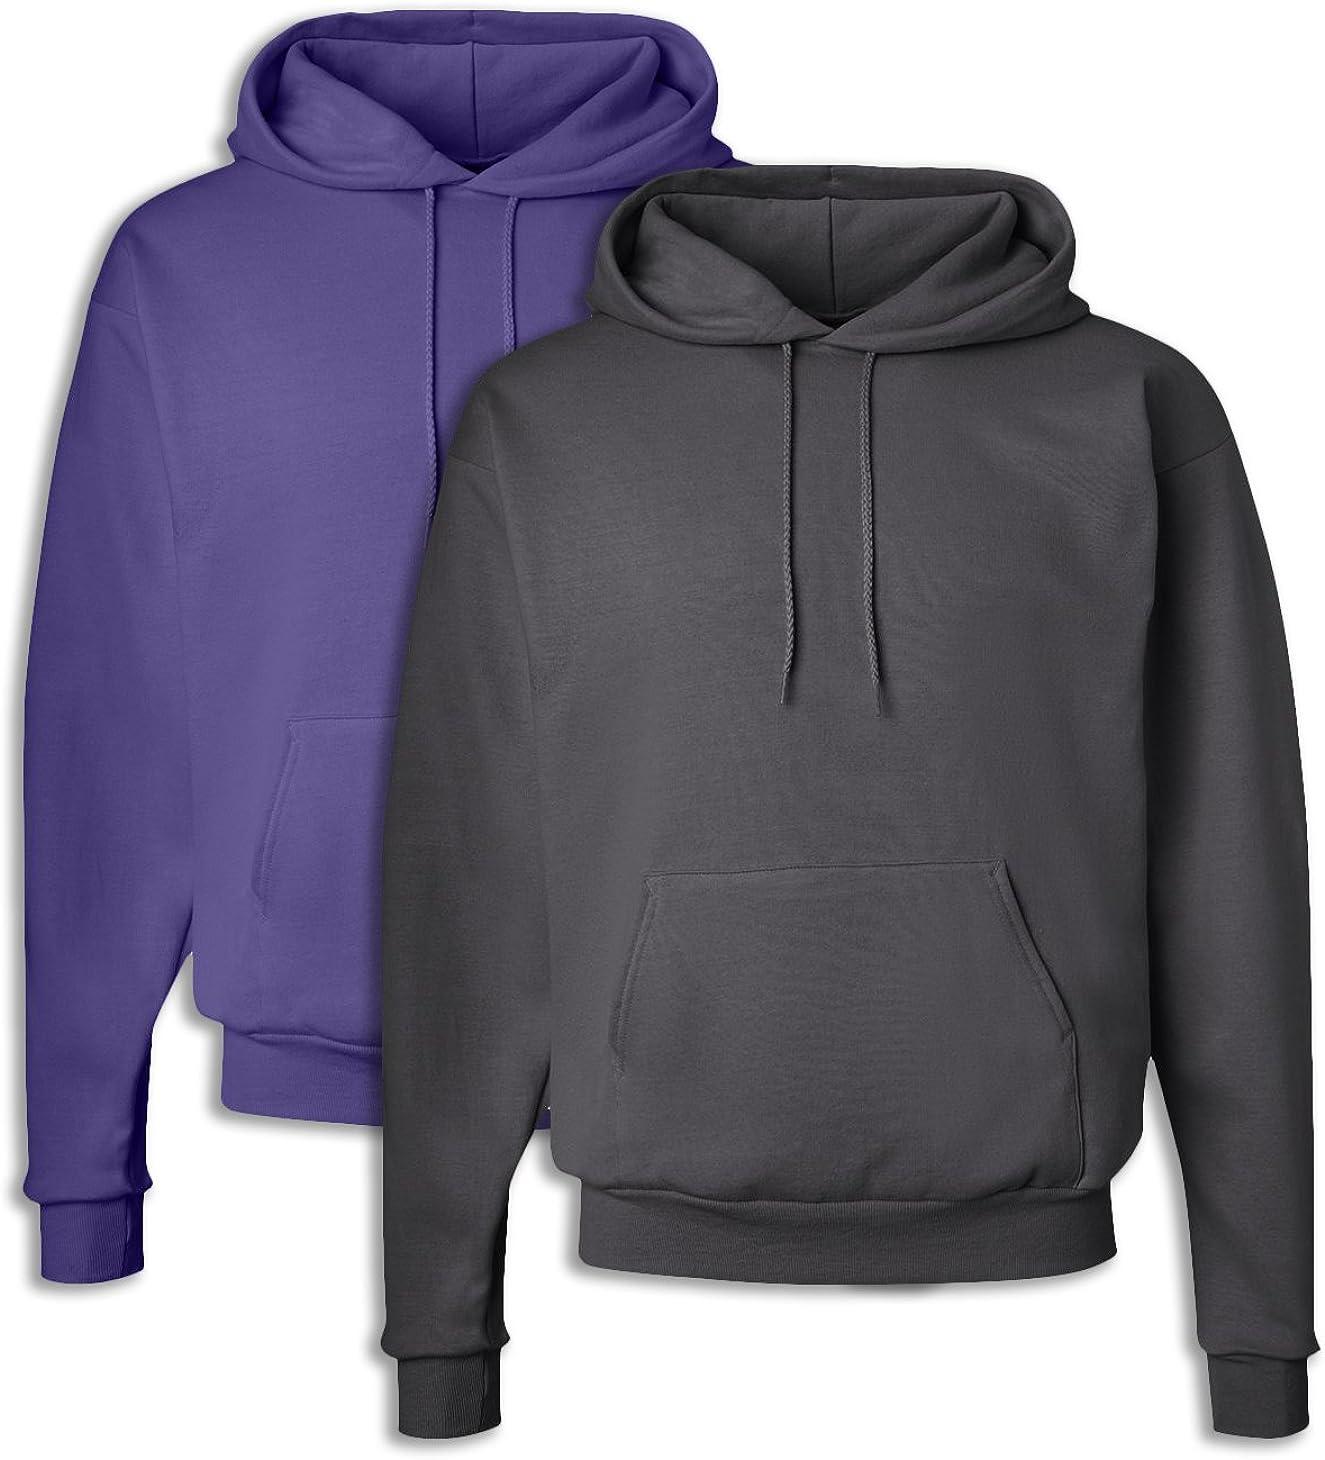 Hanes P170 Mens EcoSmart Hooded Sweatshirt Medium 1 Purple 1 Smoke Grey